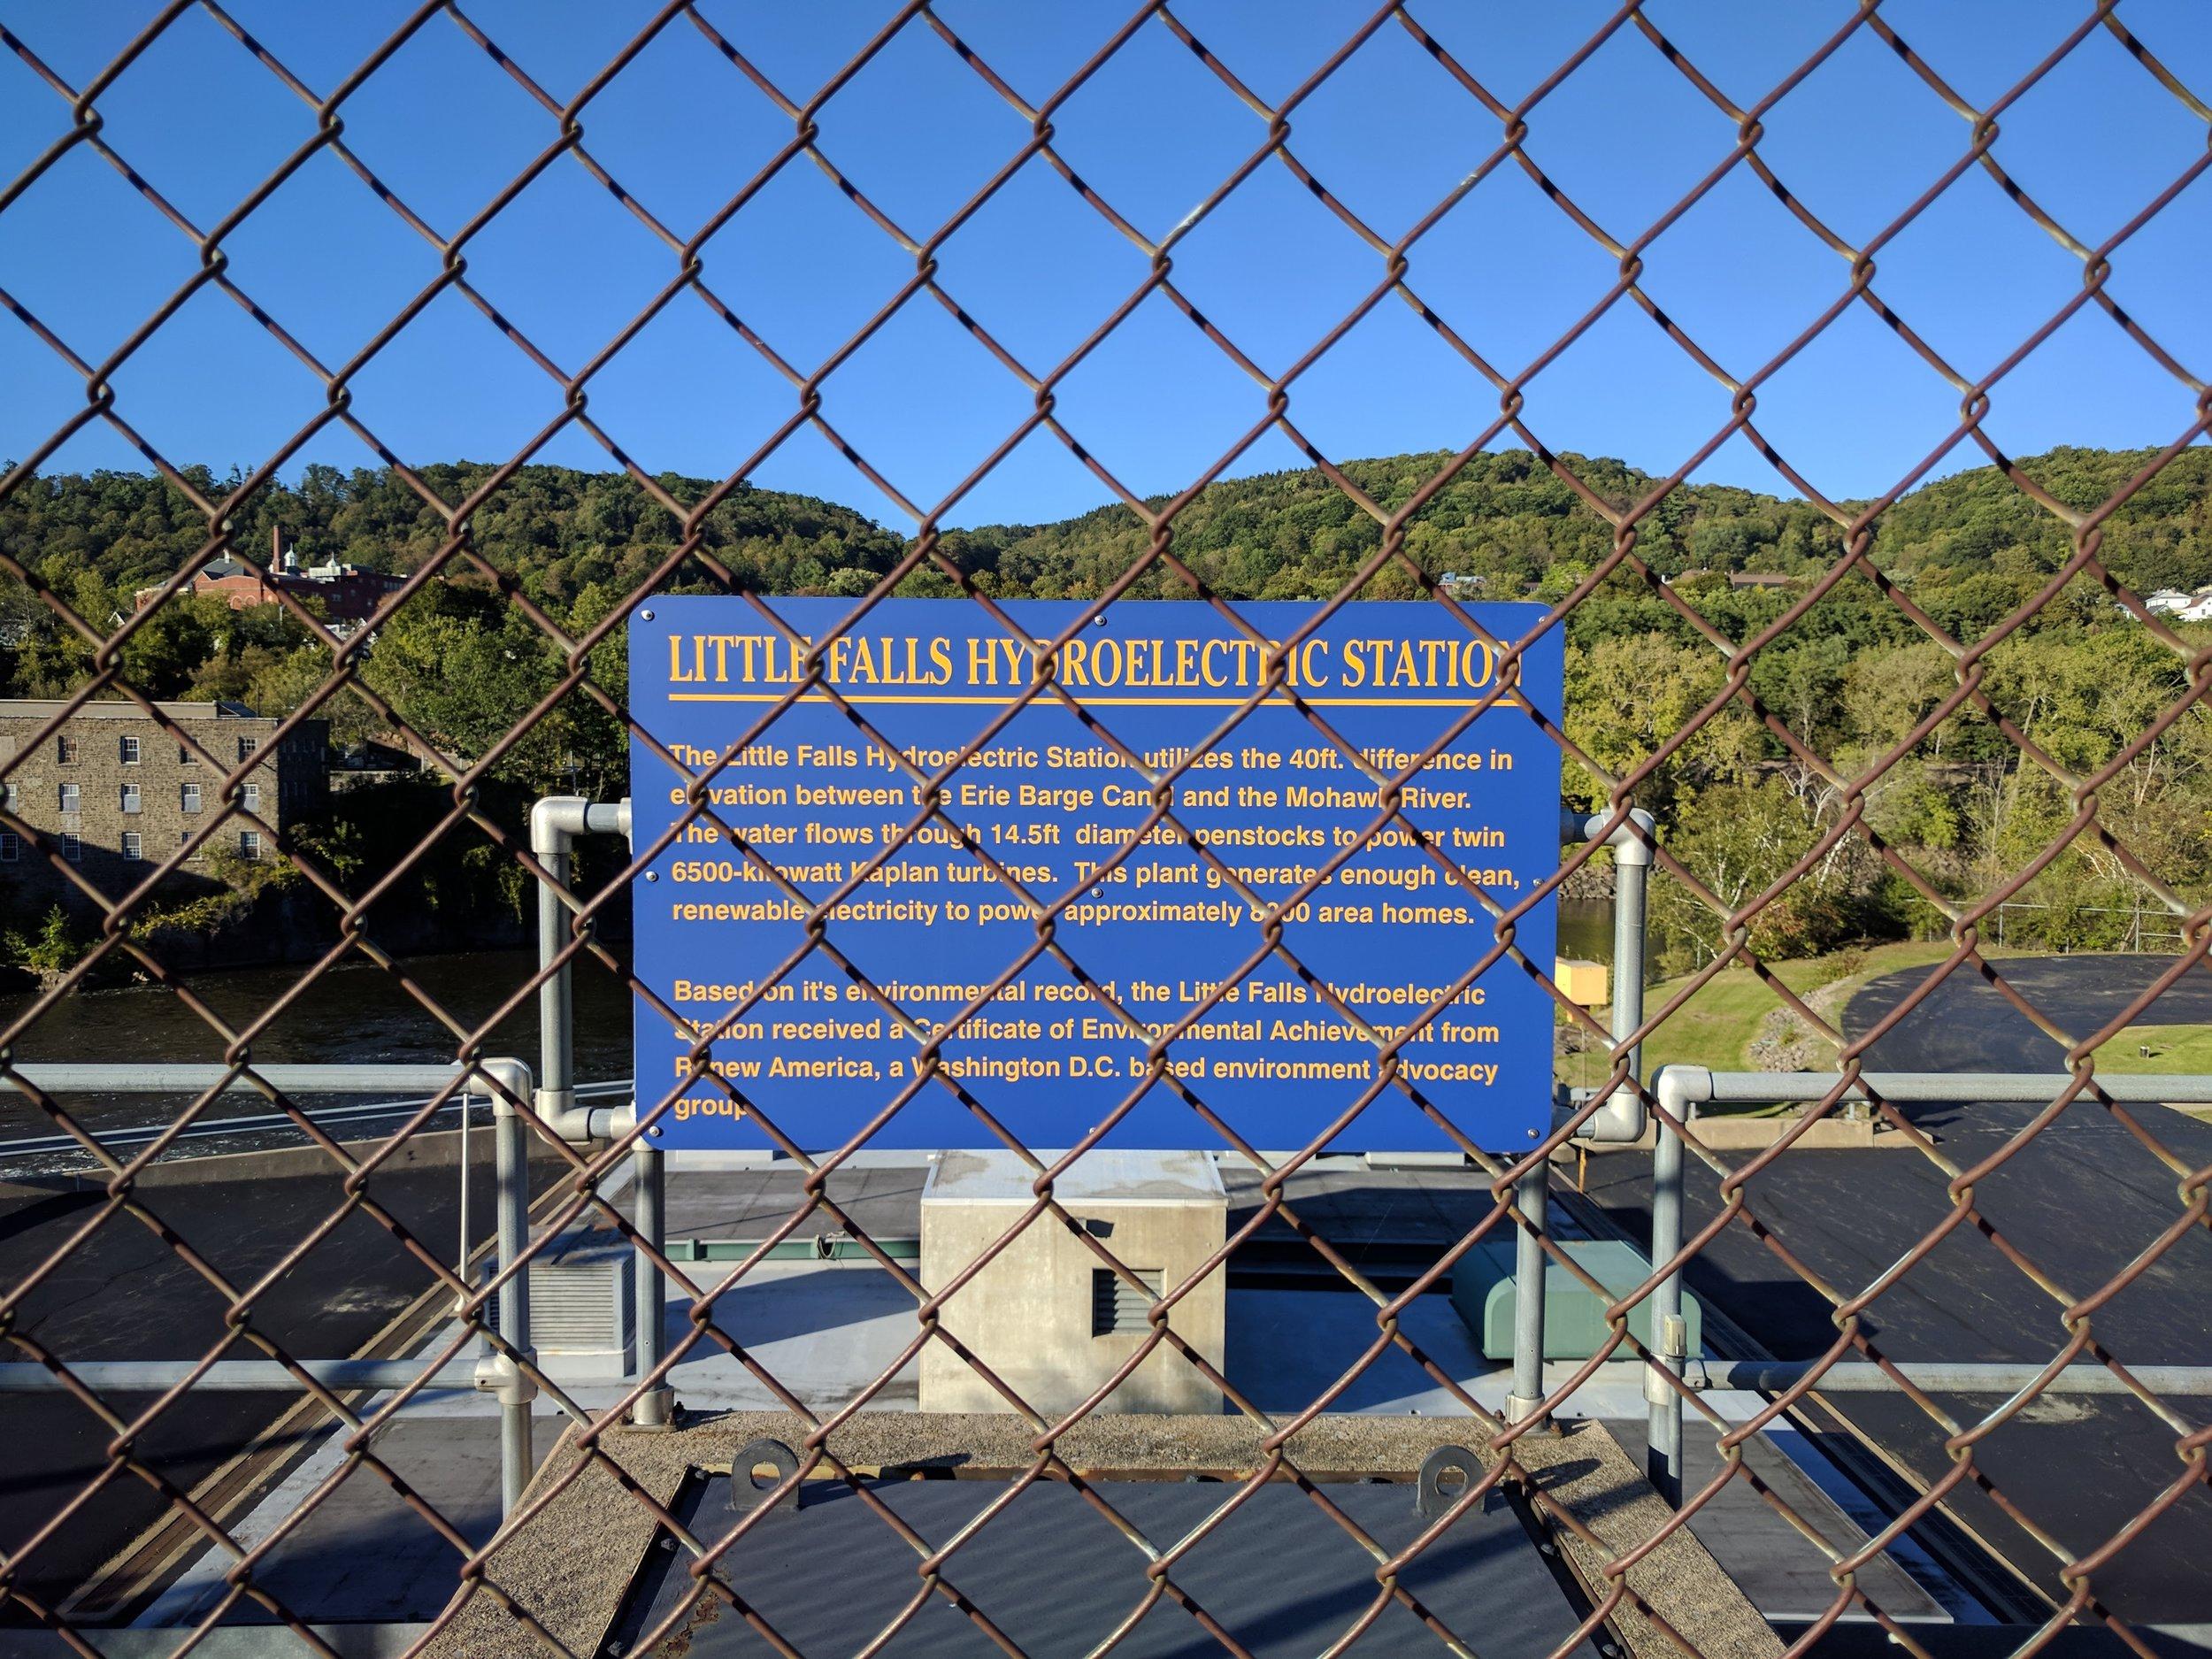 Little Falls Hydro Power Station